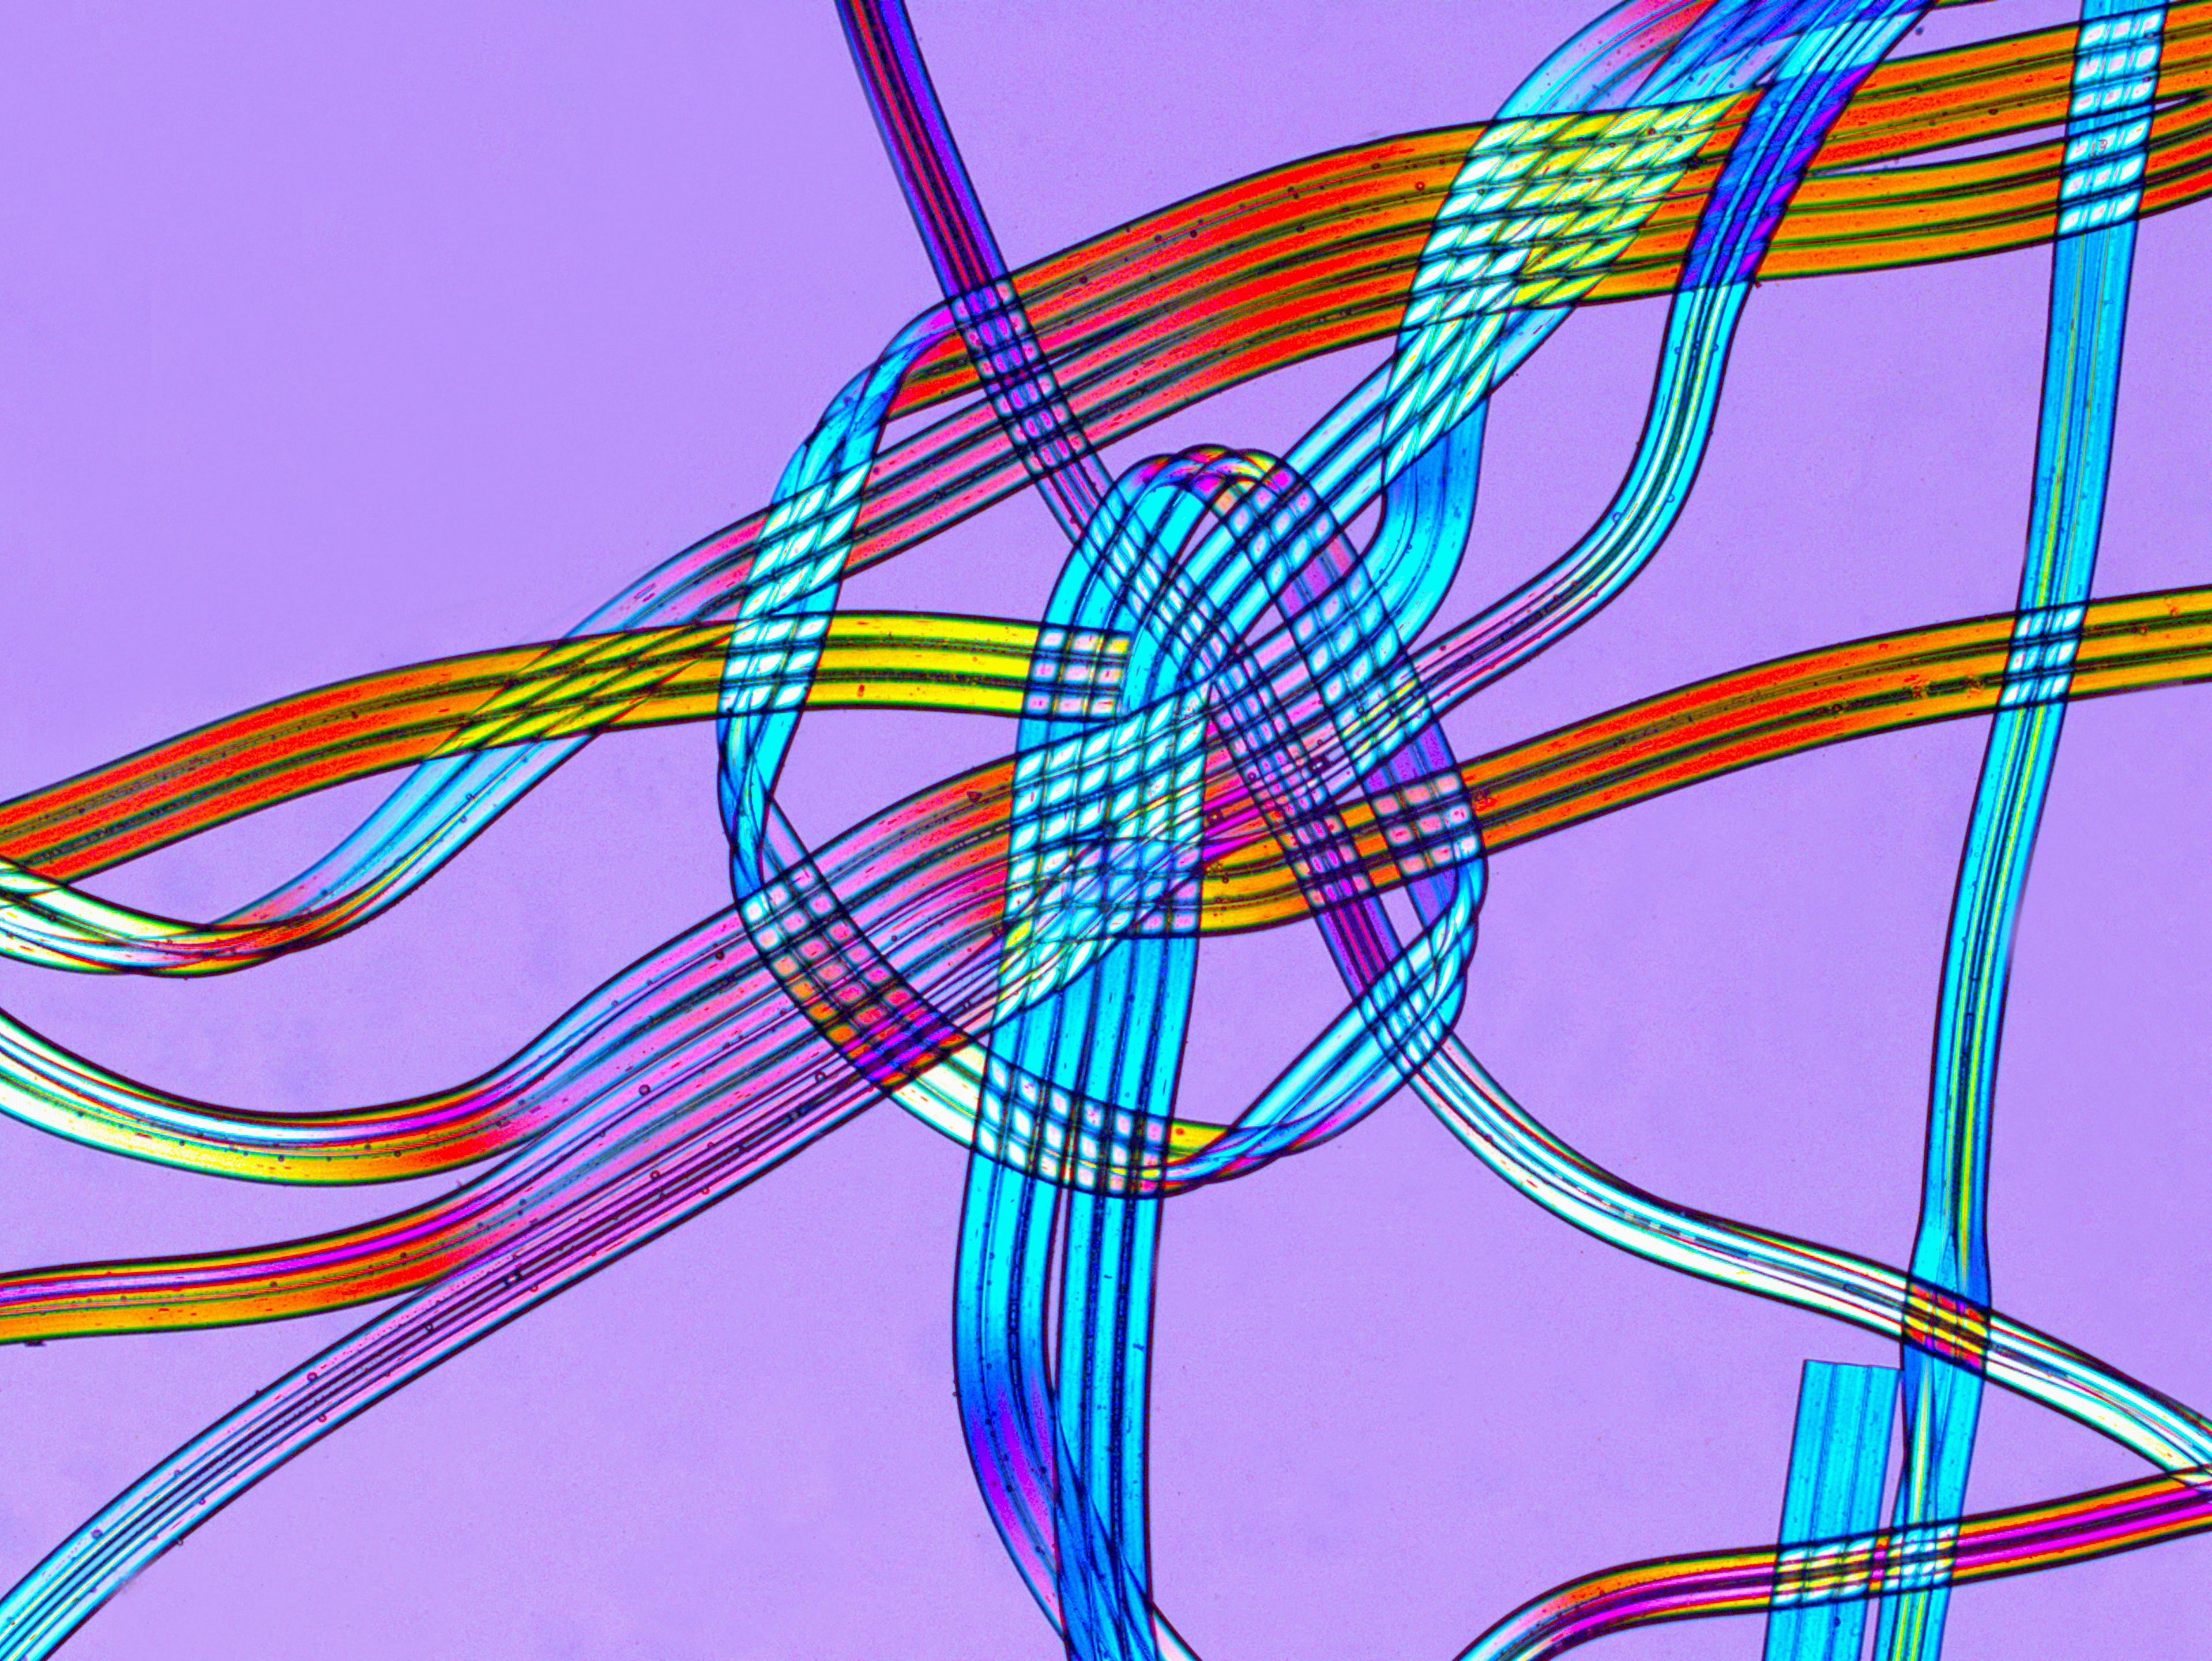 Polyurethane Dielectric Elastomer